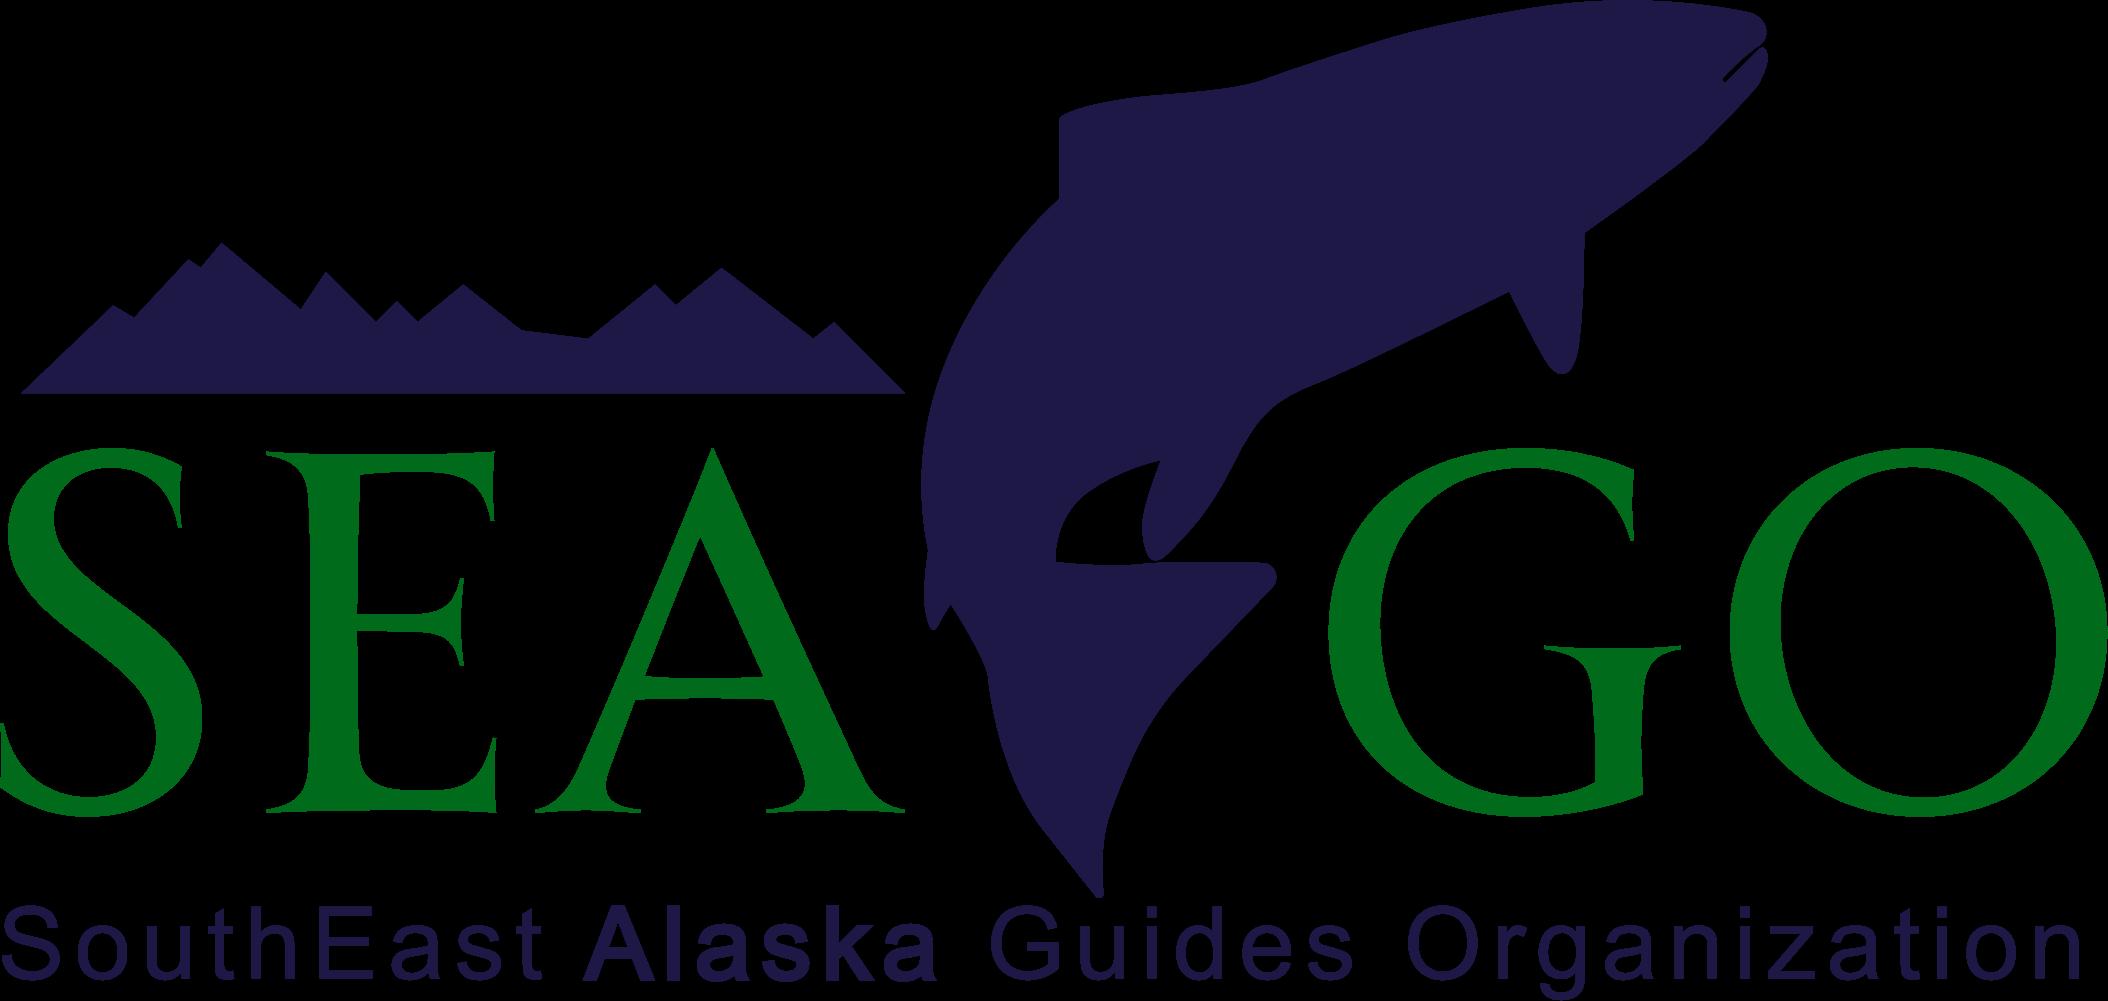 Southeast Alaska Guides Organization